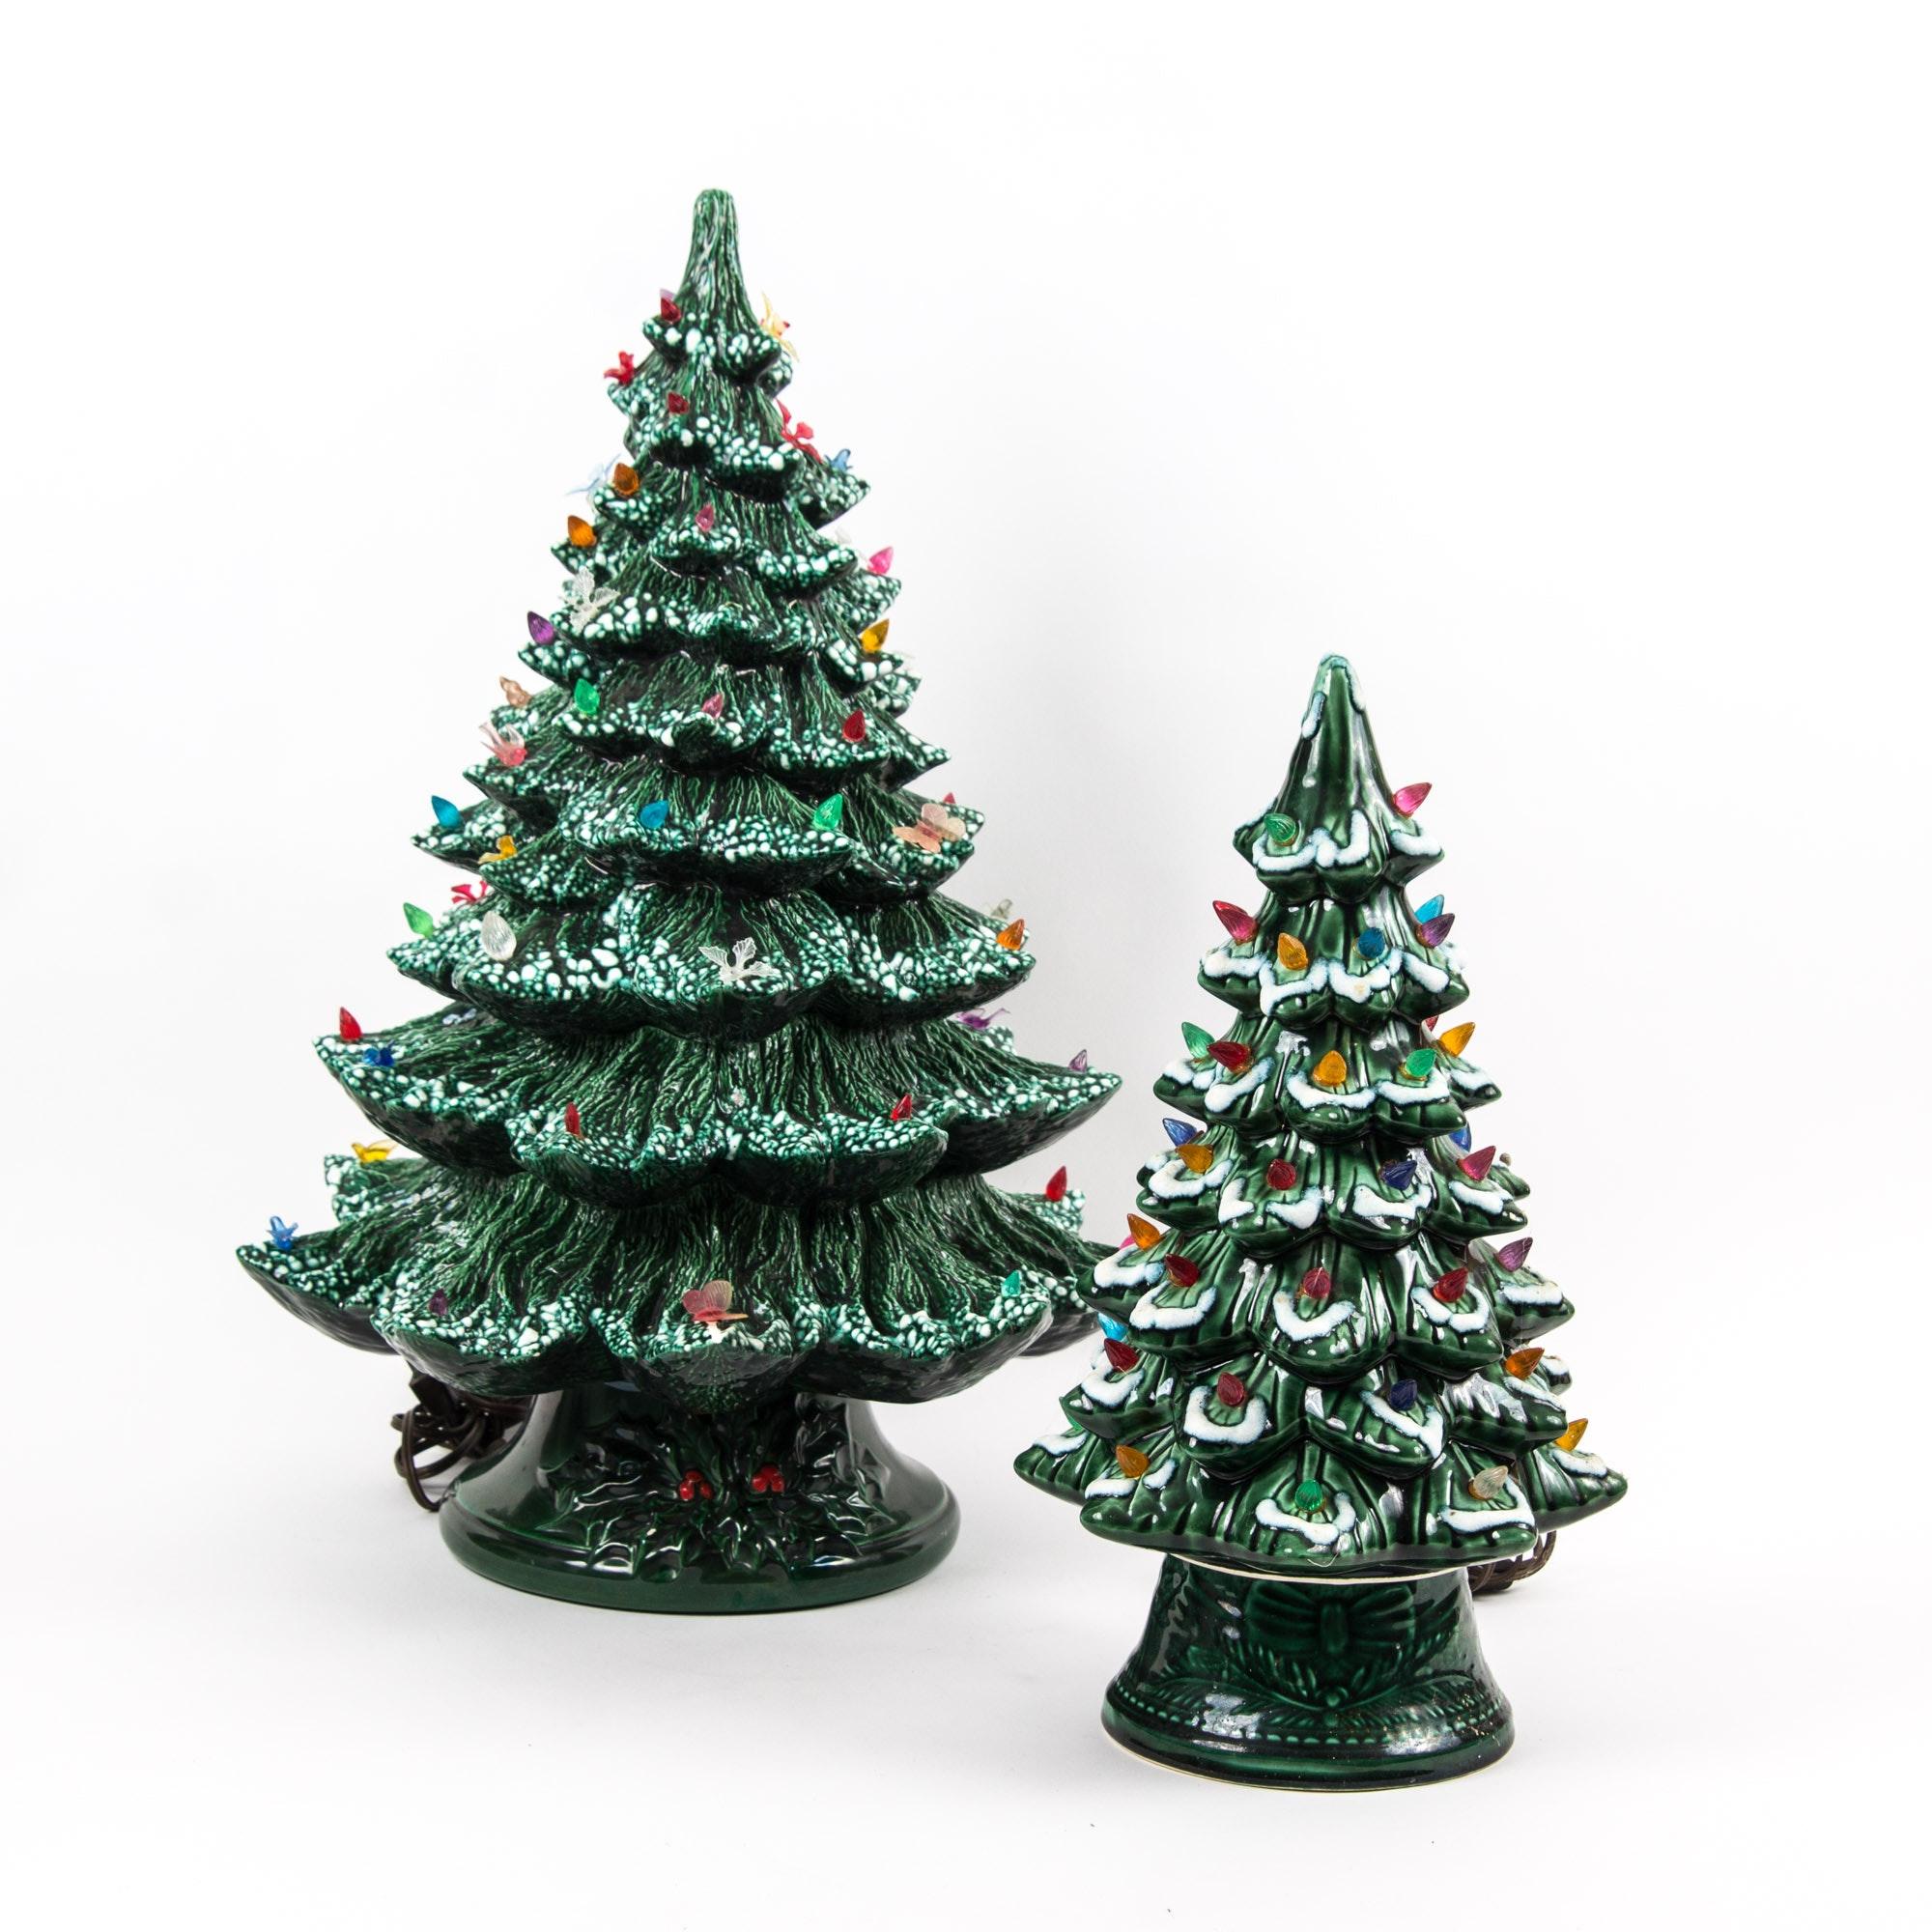 Vintage Ceramic Christmas Tree For Sale